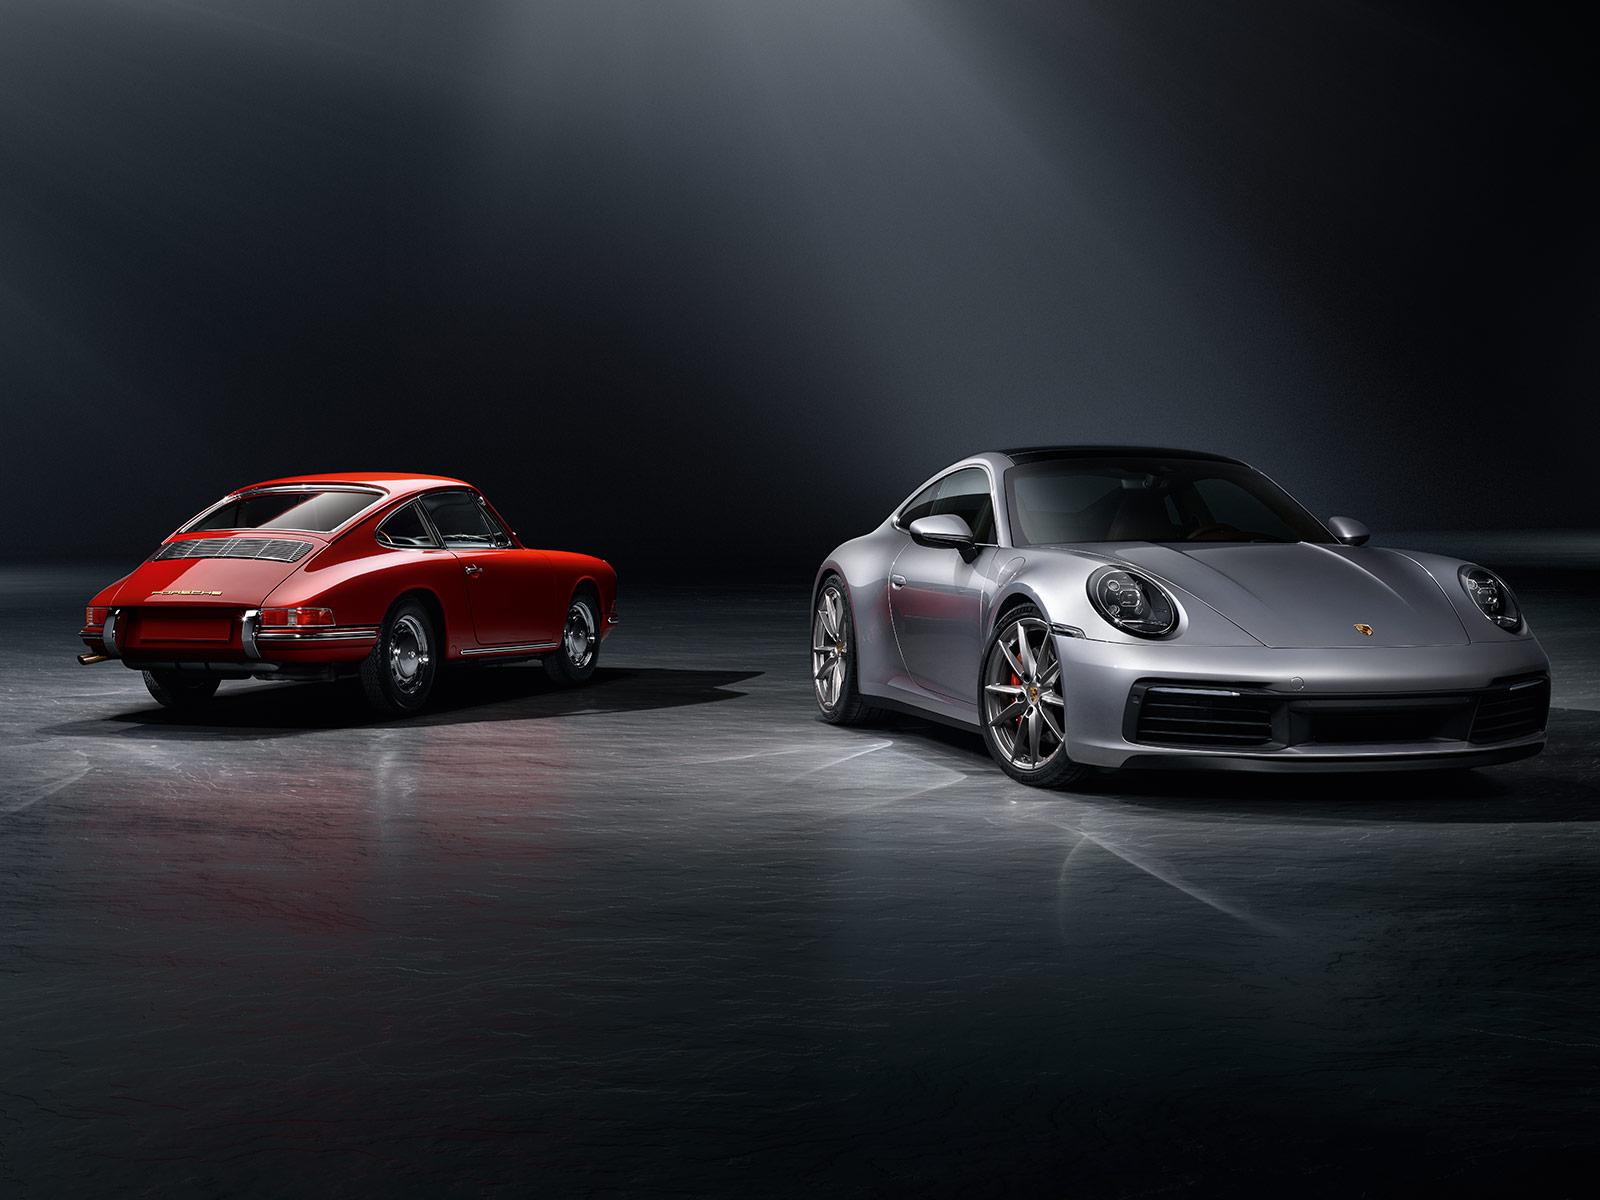 Porsche 911 GT3 RS - Идея 911 GT3 RS